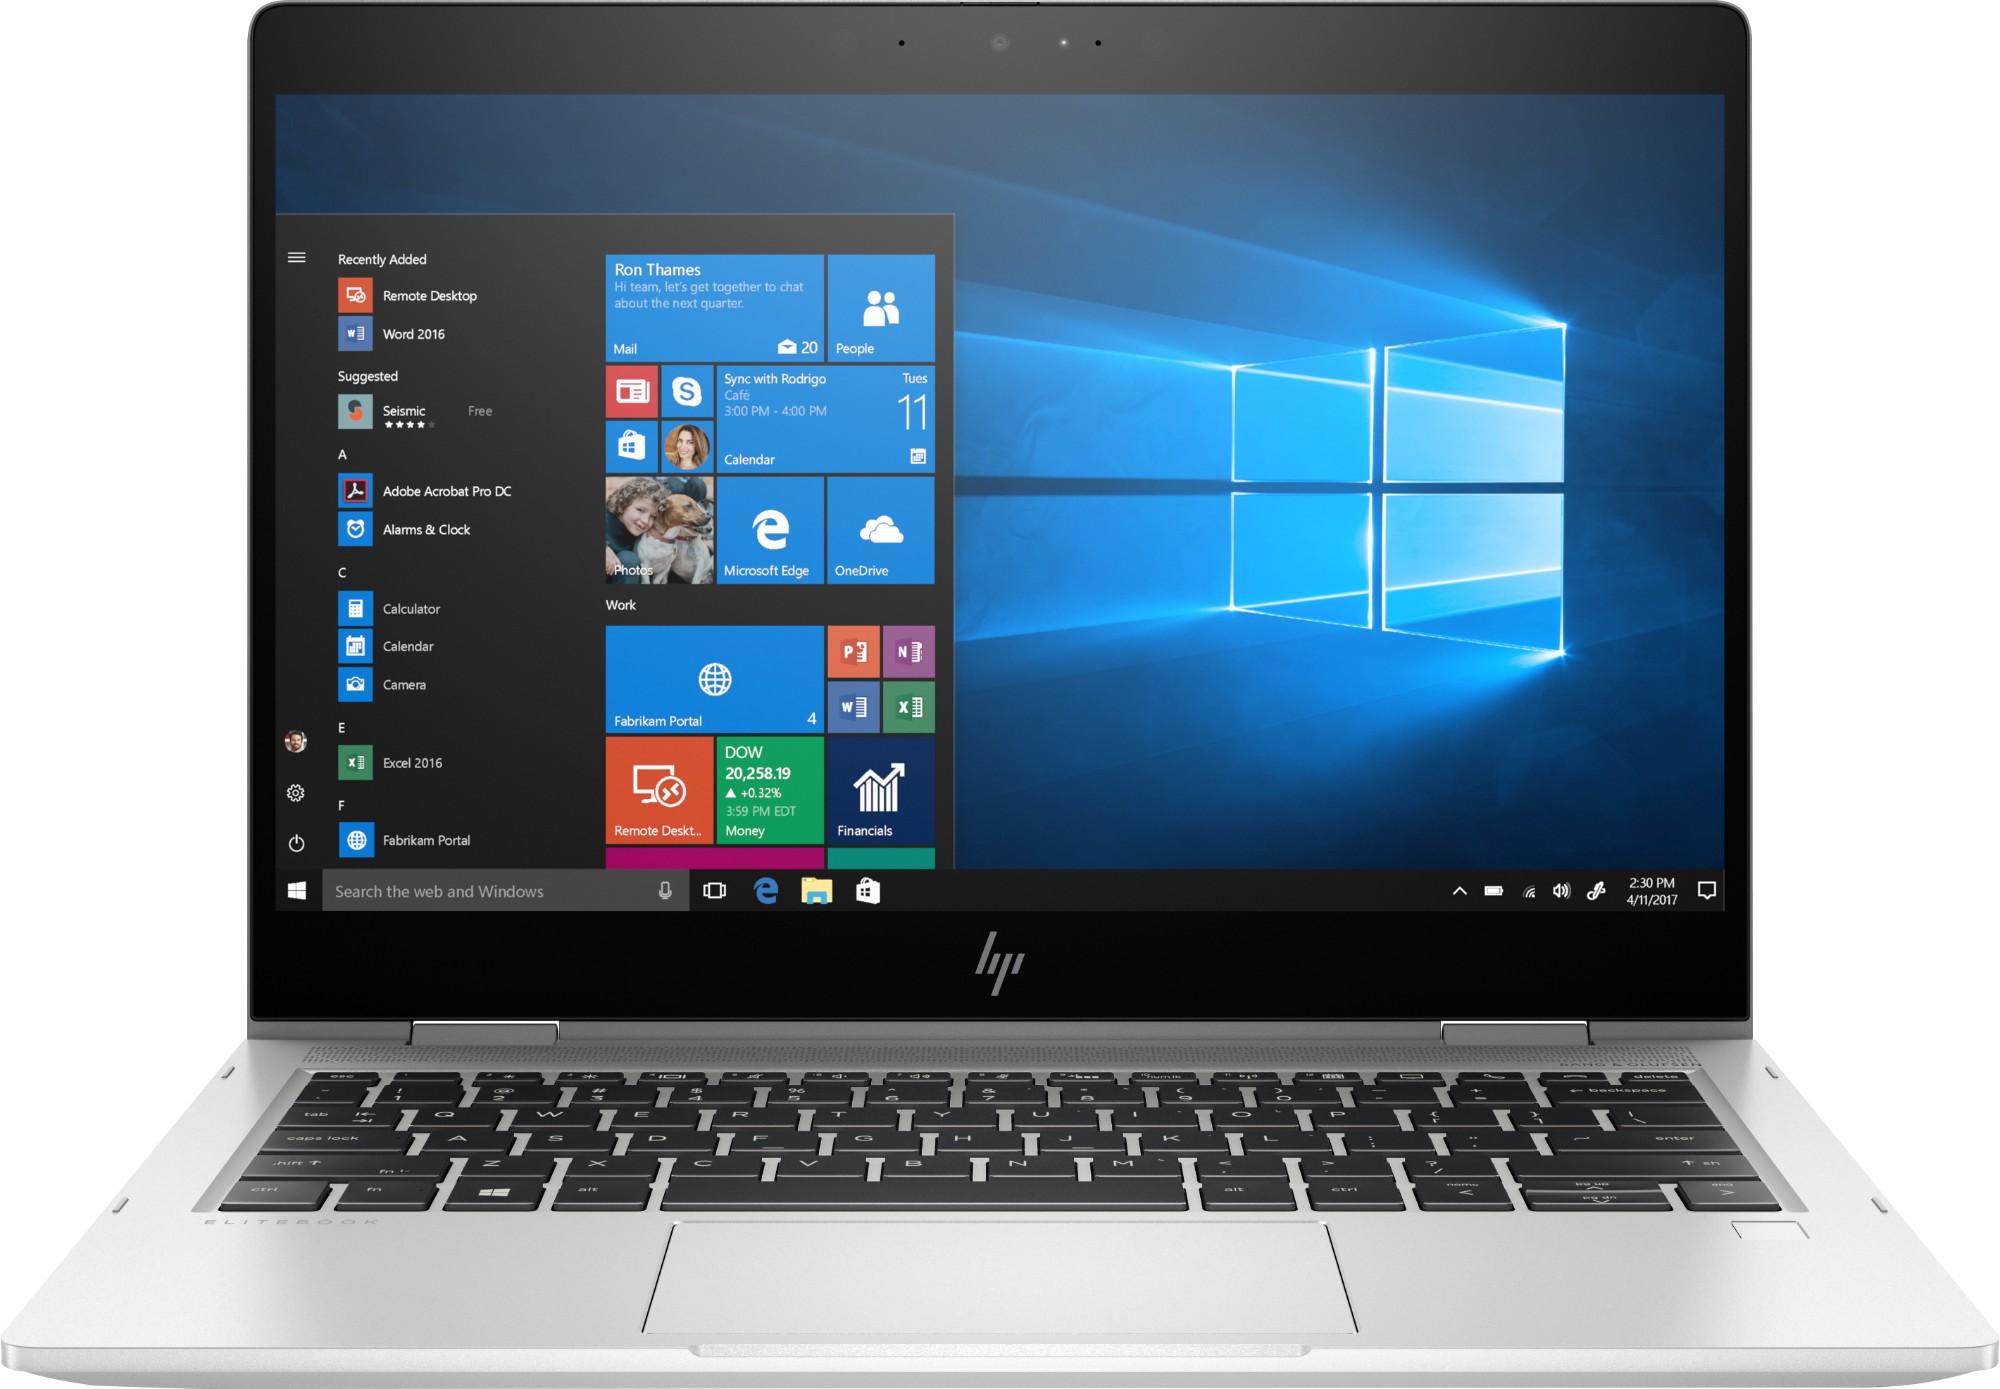 "HP EliteBook x360 830 G6 Híbrido (2-en-1) Plata 33,8 cm (13.3"") 1920 x 1080 Pixeles Pantalla táctil 8ª generación de procesadores Intel® Core™ i5 16 GB DDR4-SDRAM 512 GB SSD Wi-Fi 6 (802.11ax) Windows 10 Pro"